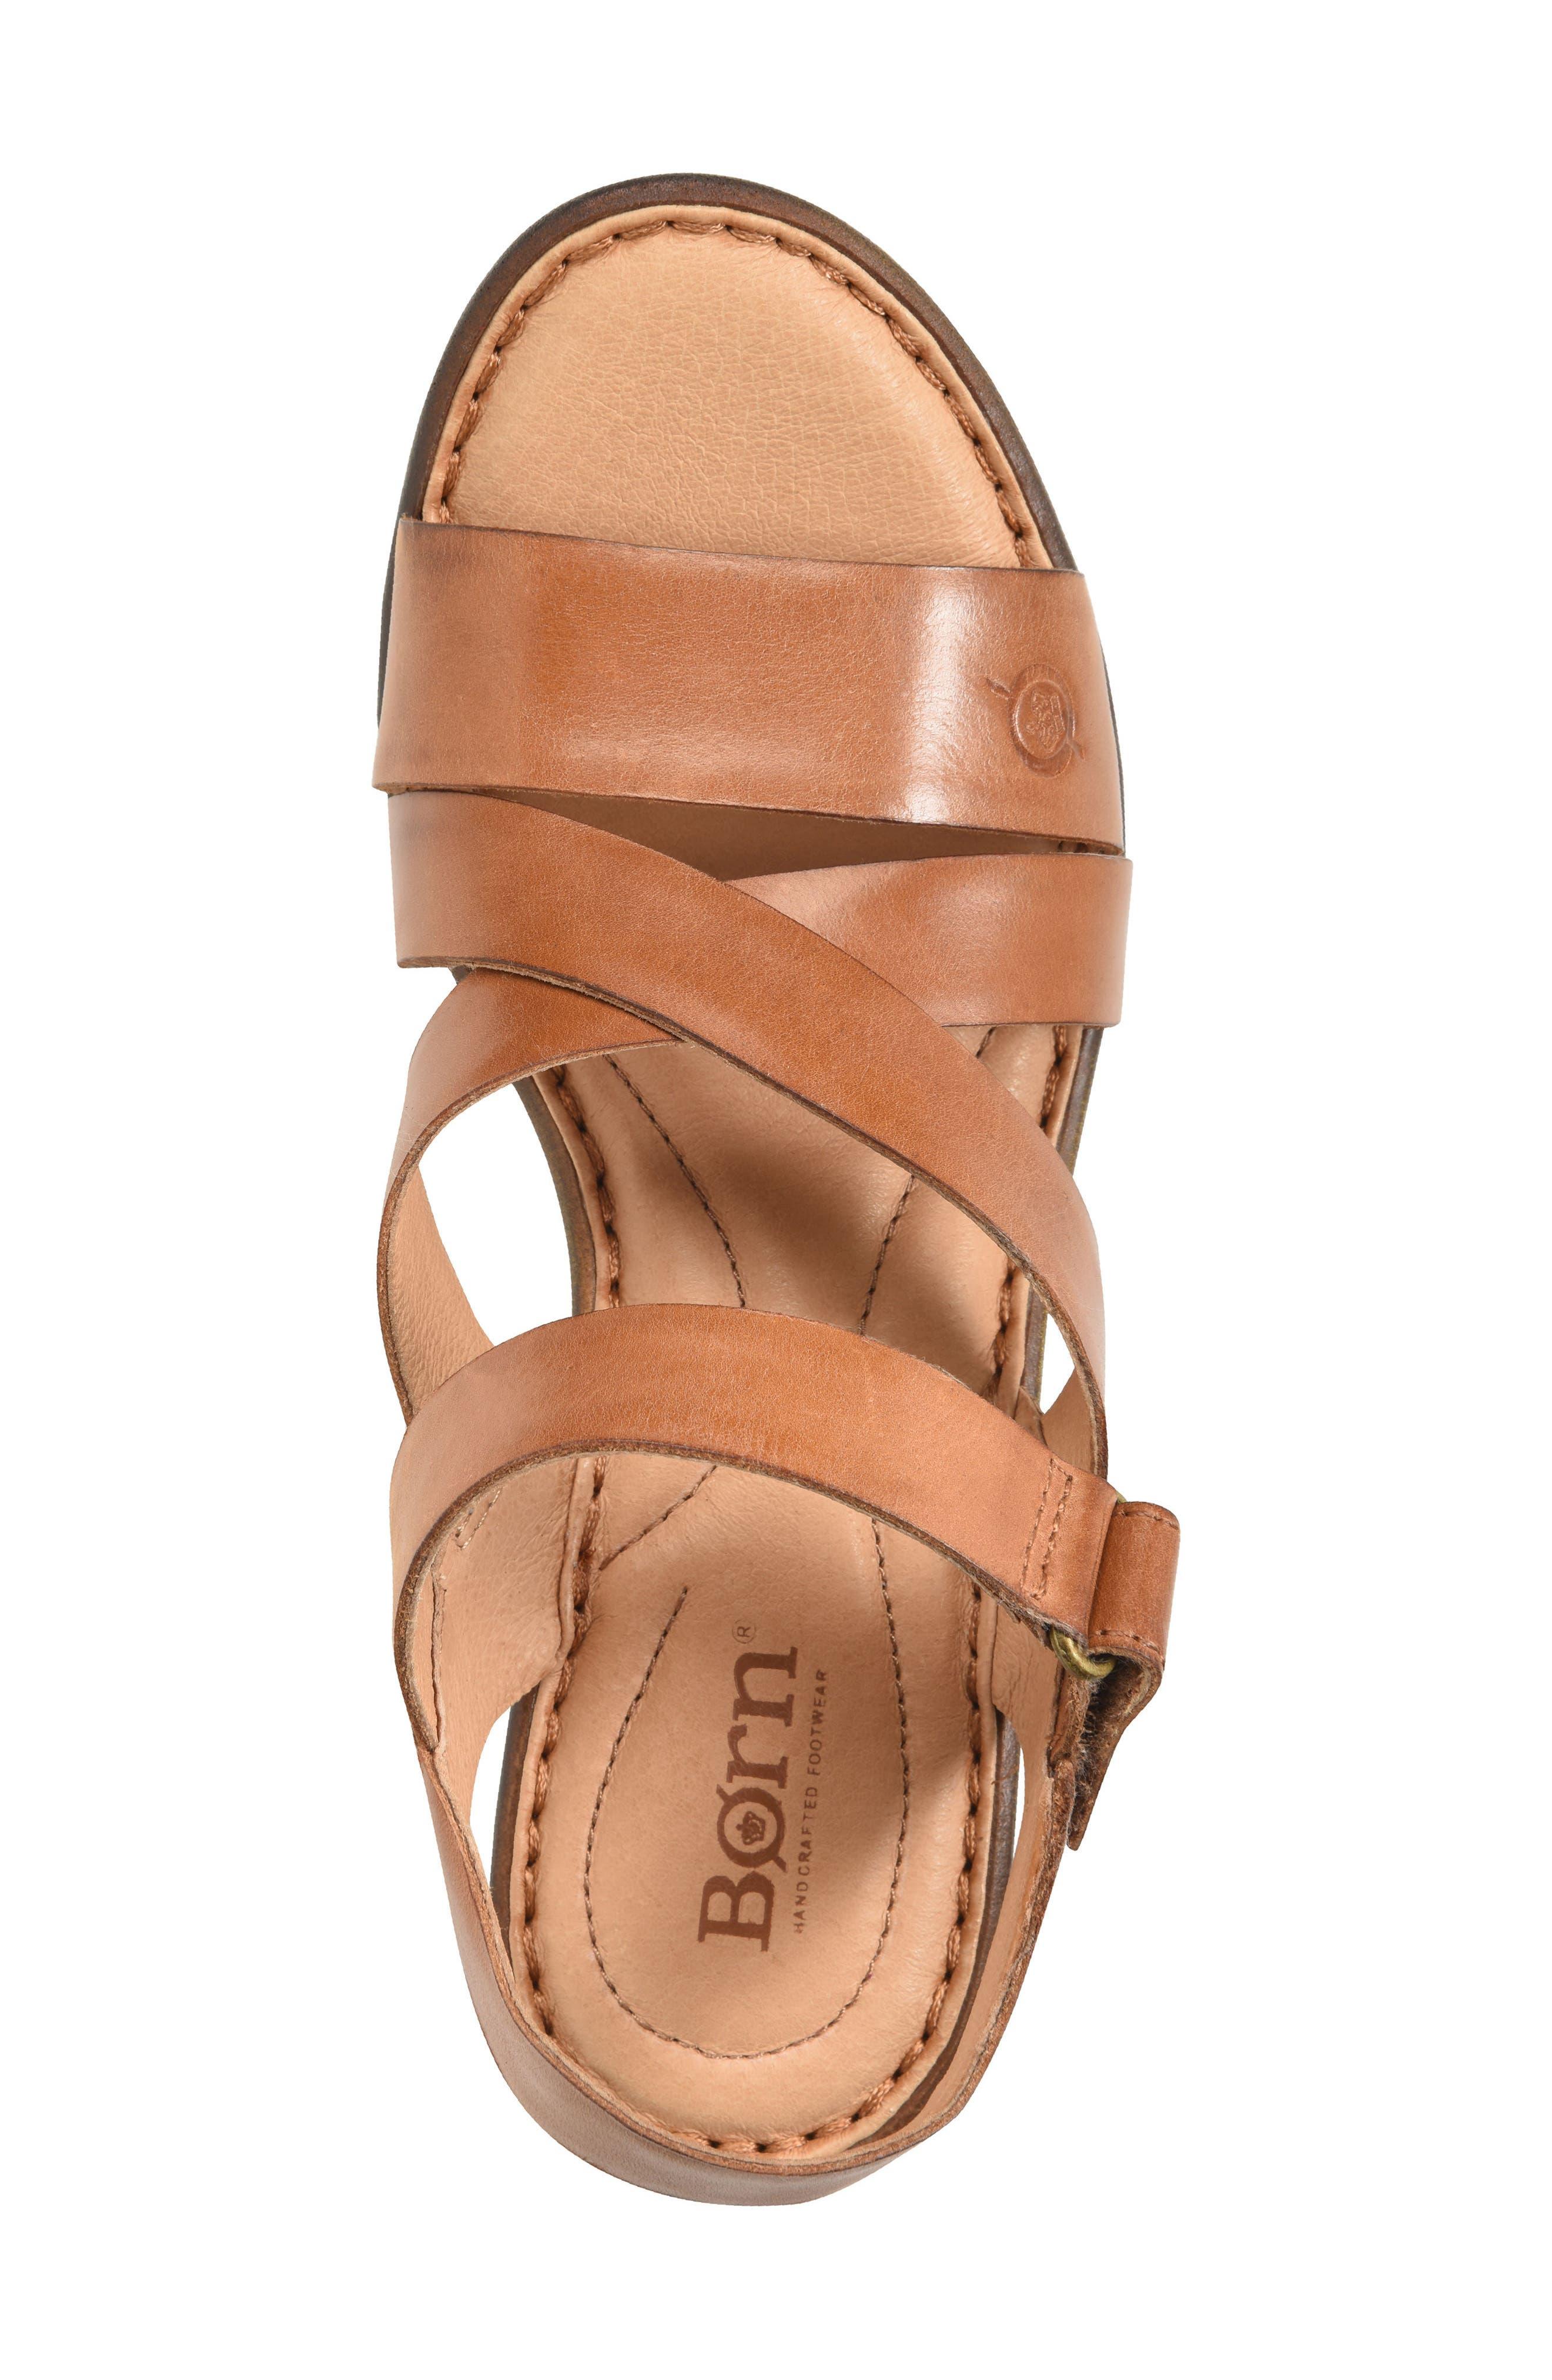 Cubera Platform Sandal,                             Alternate thumbnail 5, color,                             Brown Leather